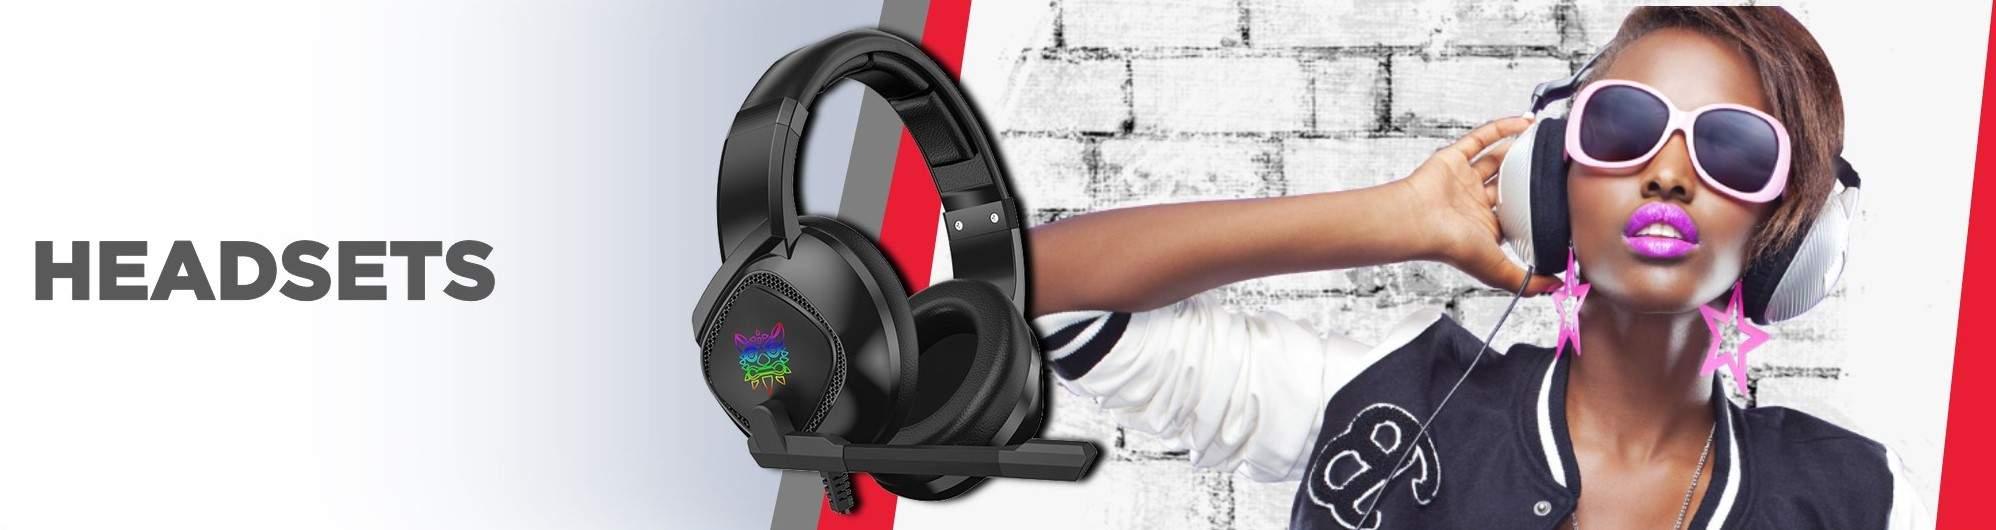 Matrix Warehouse Headsets